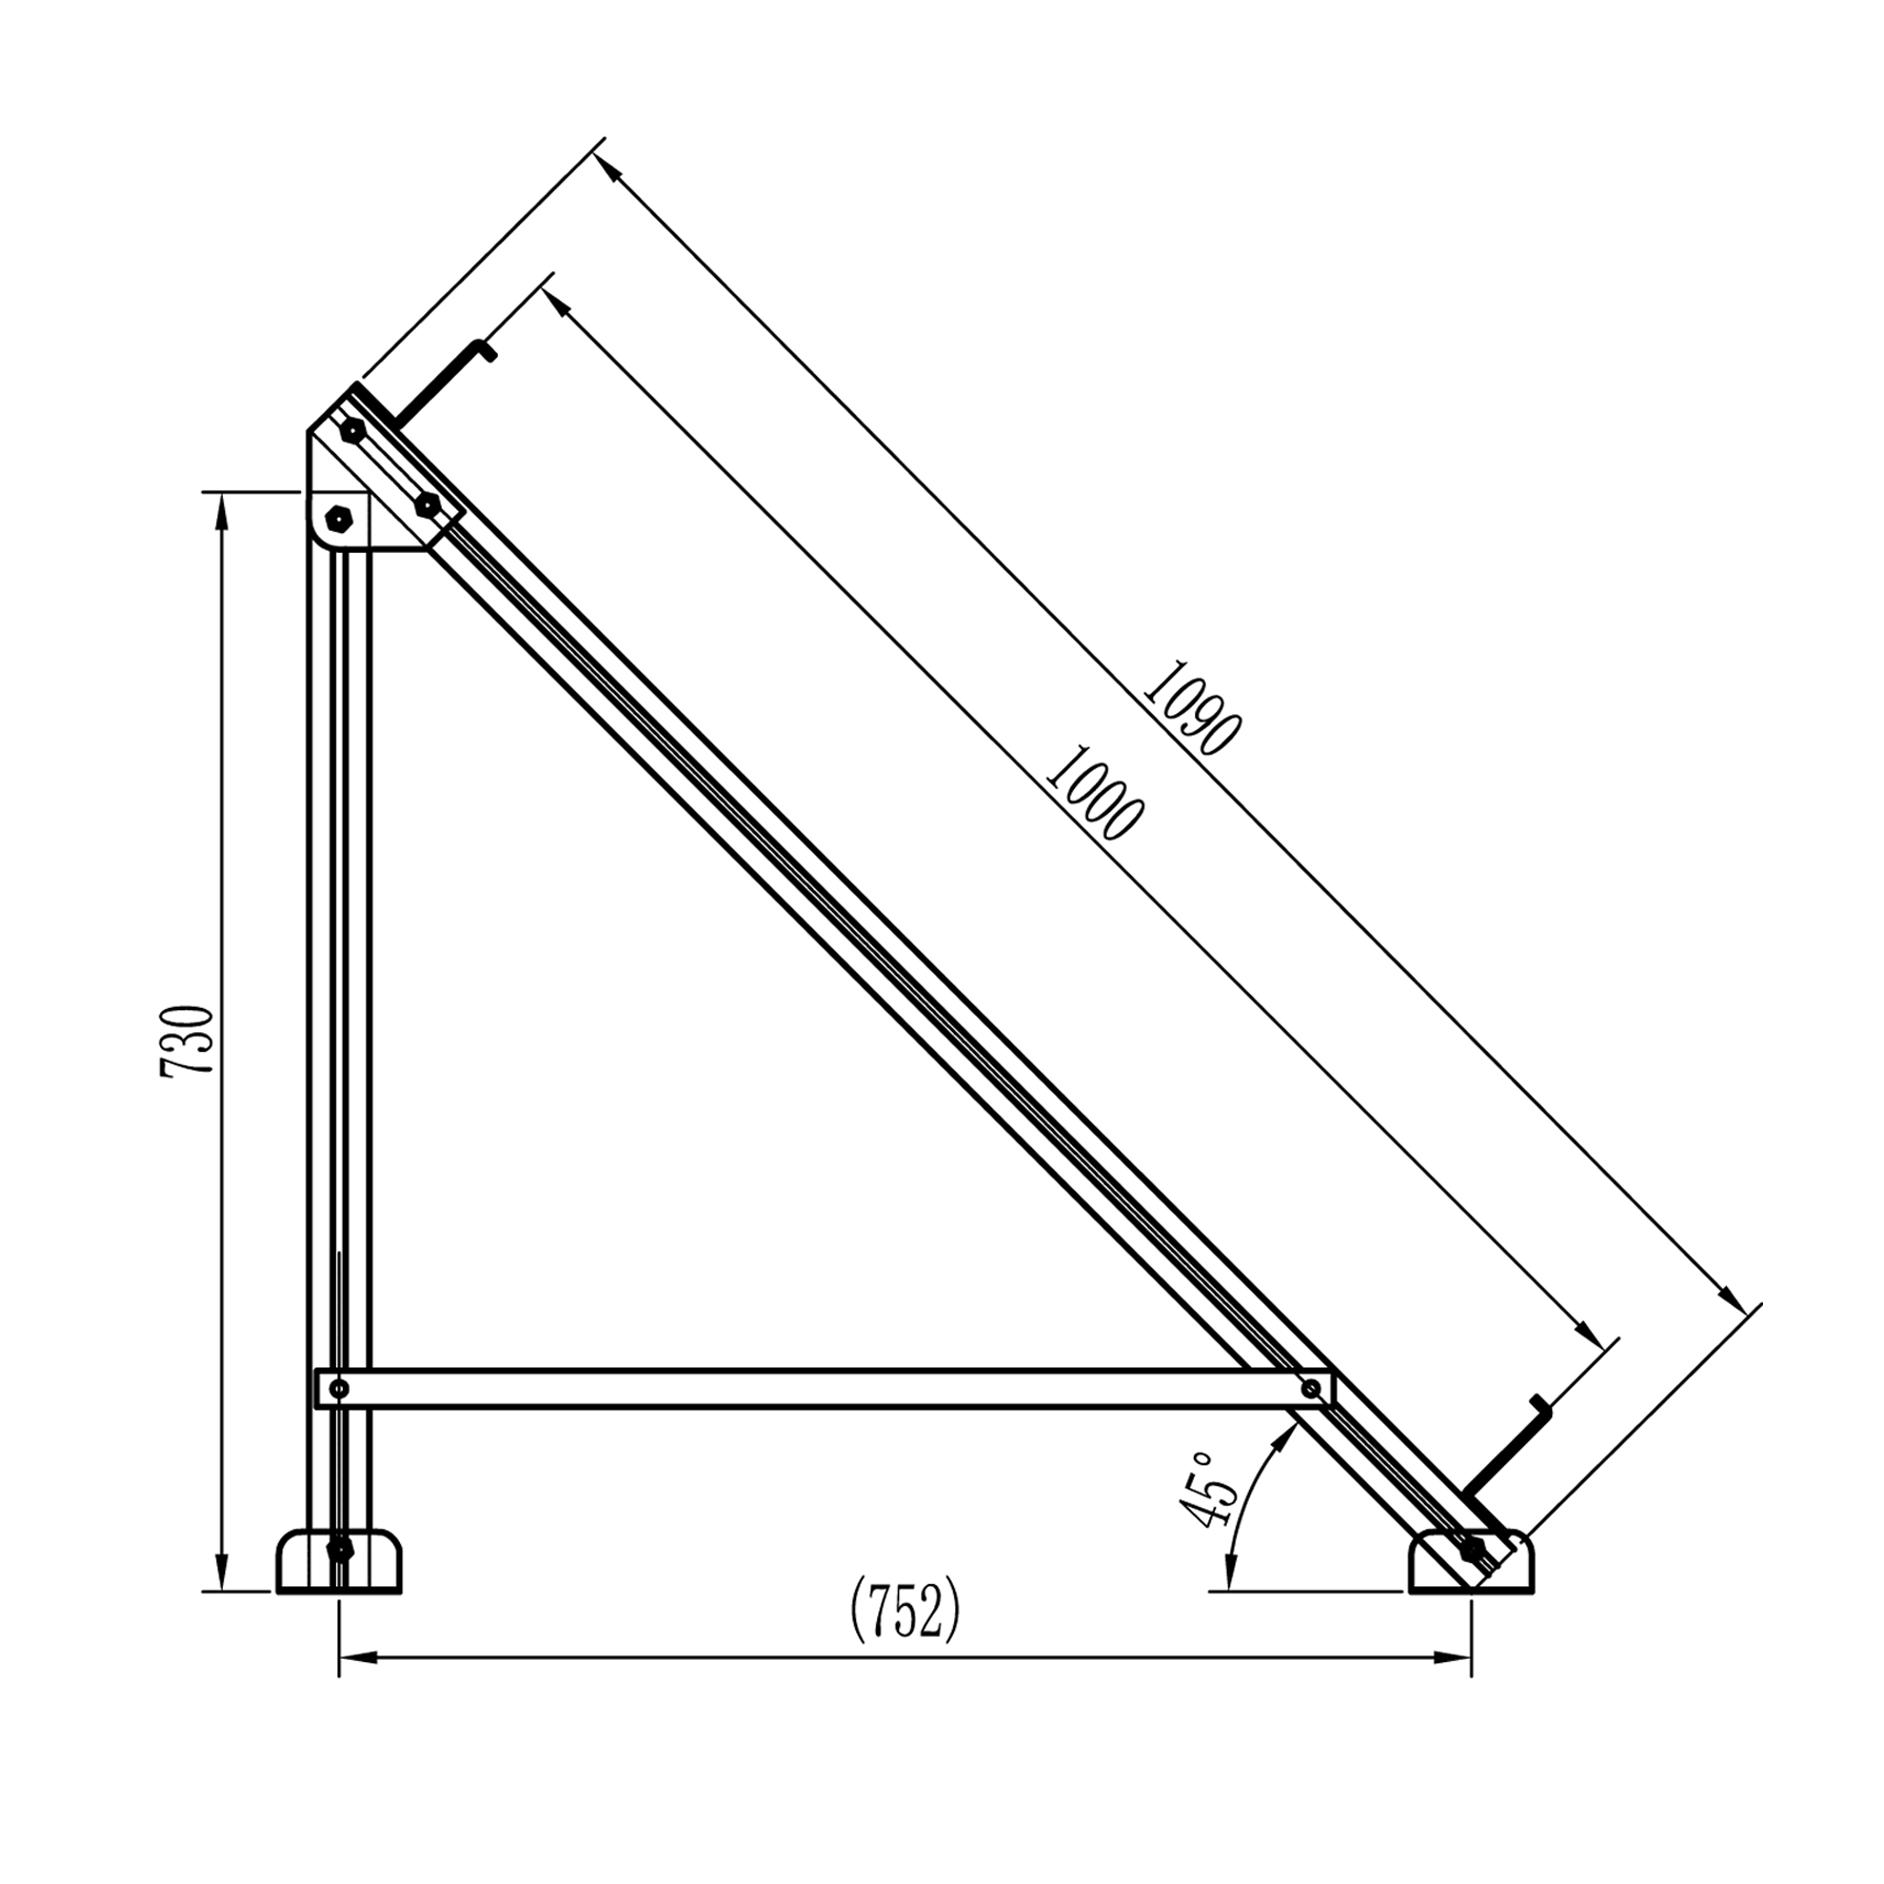 45 deg frame for flat plate collector